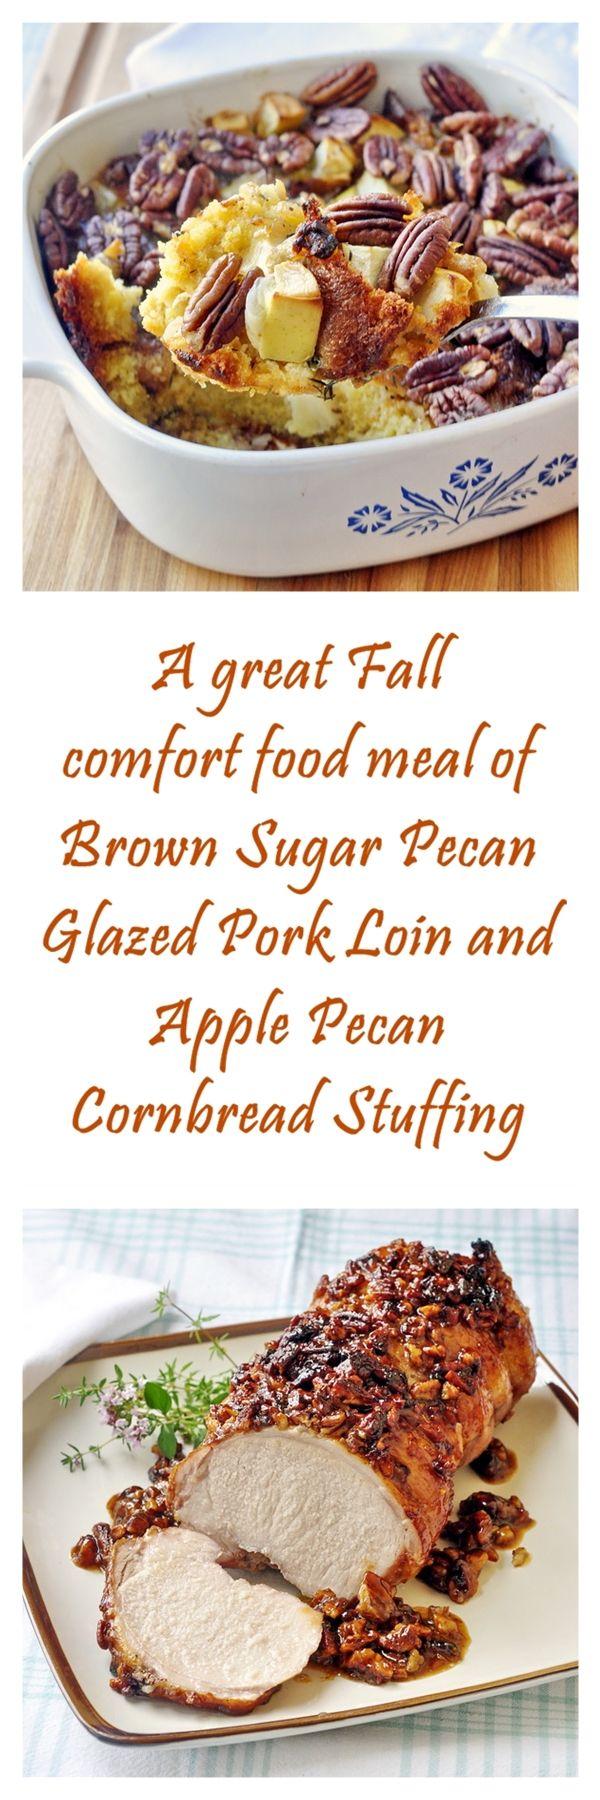 ... Pecan Glazed Pork Loin and Apple Pecan Cornbread Stuffing. | Pinterest